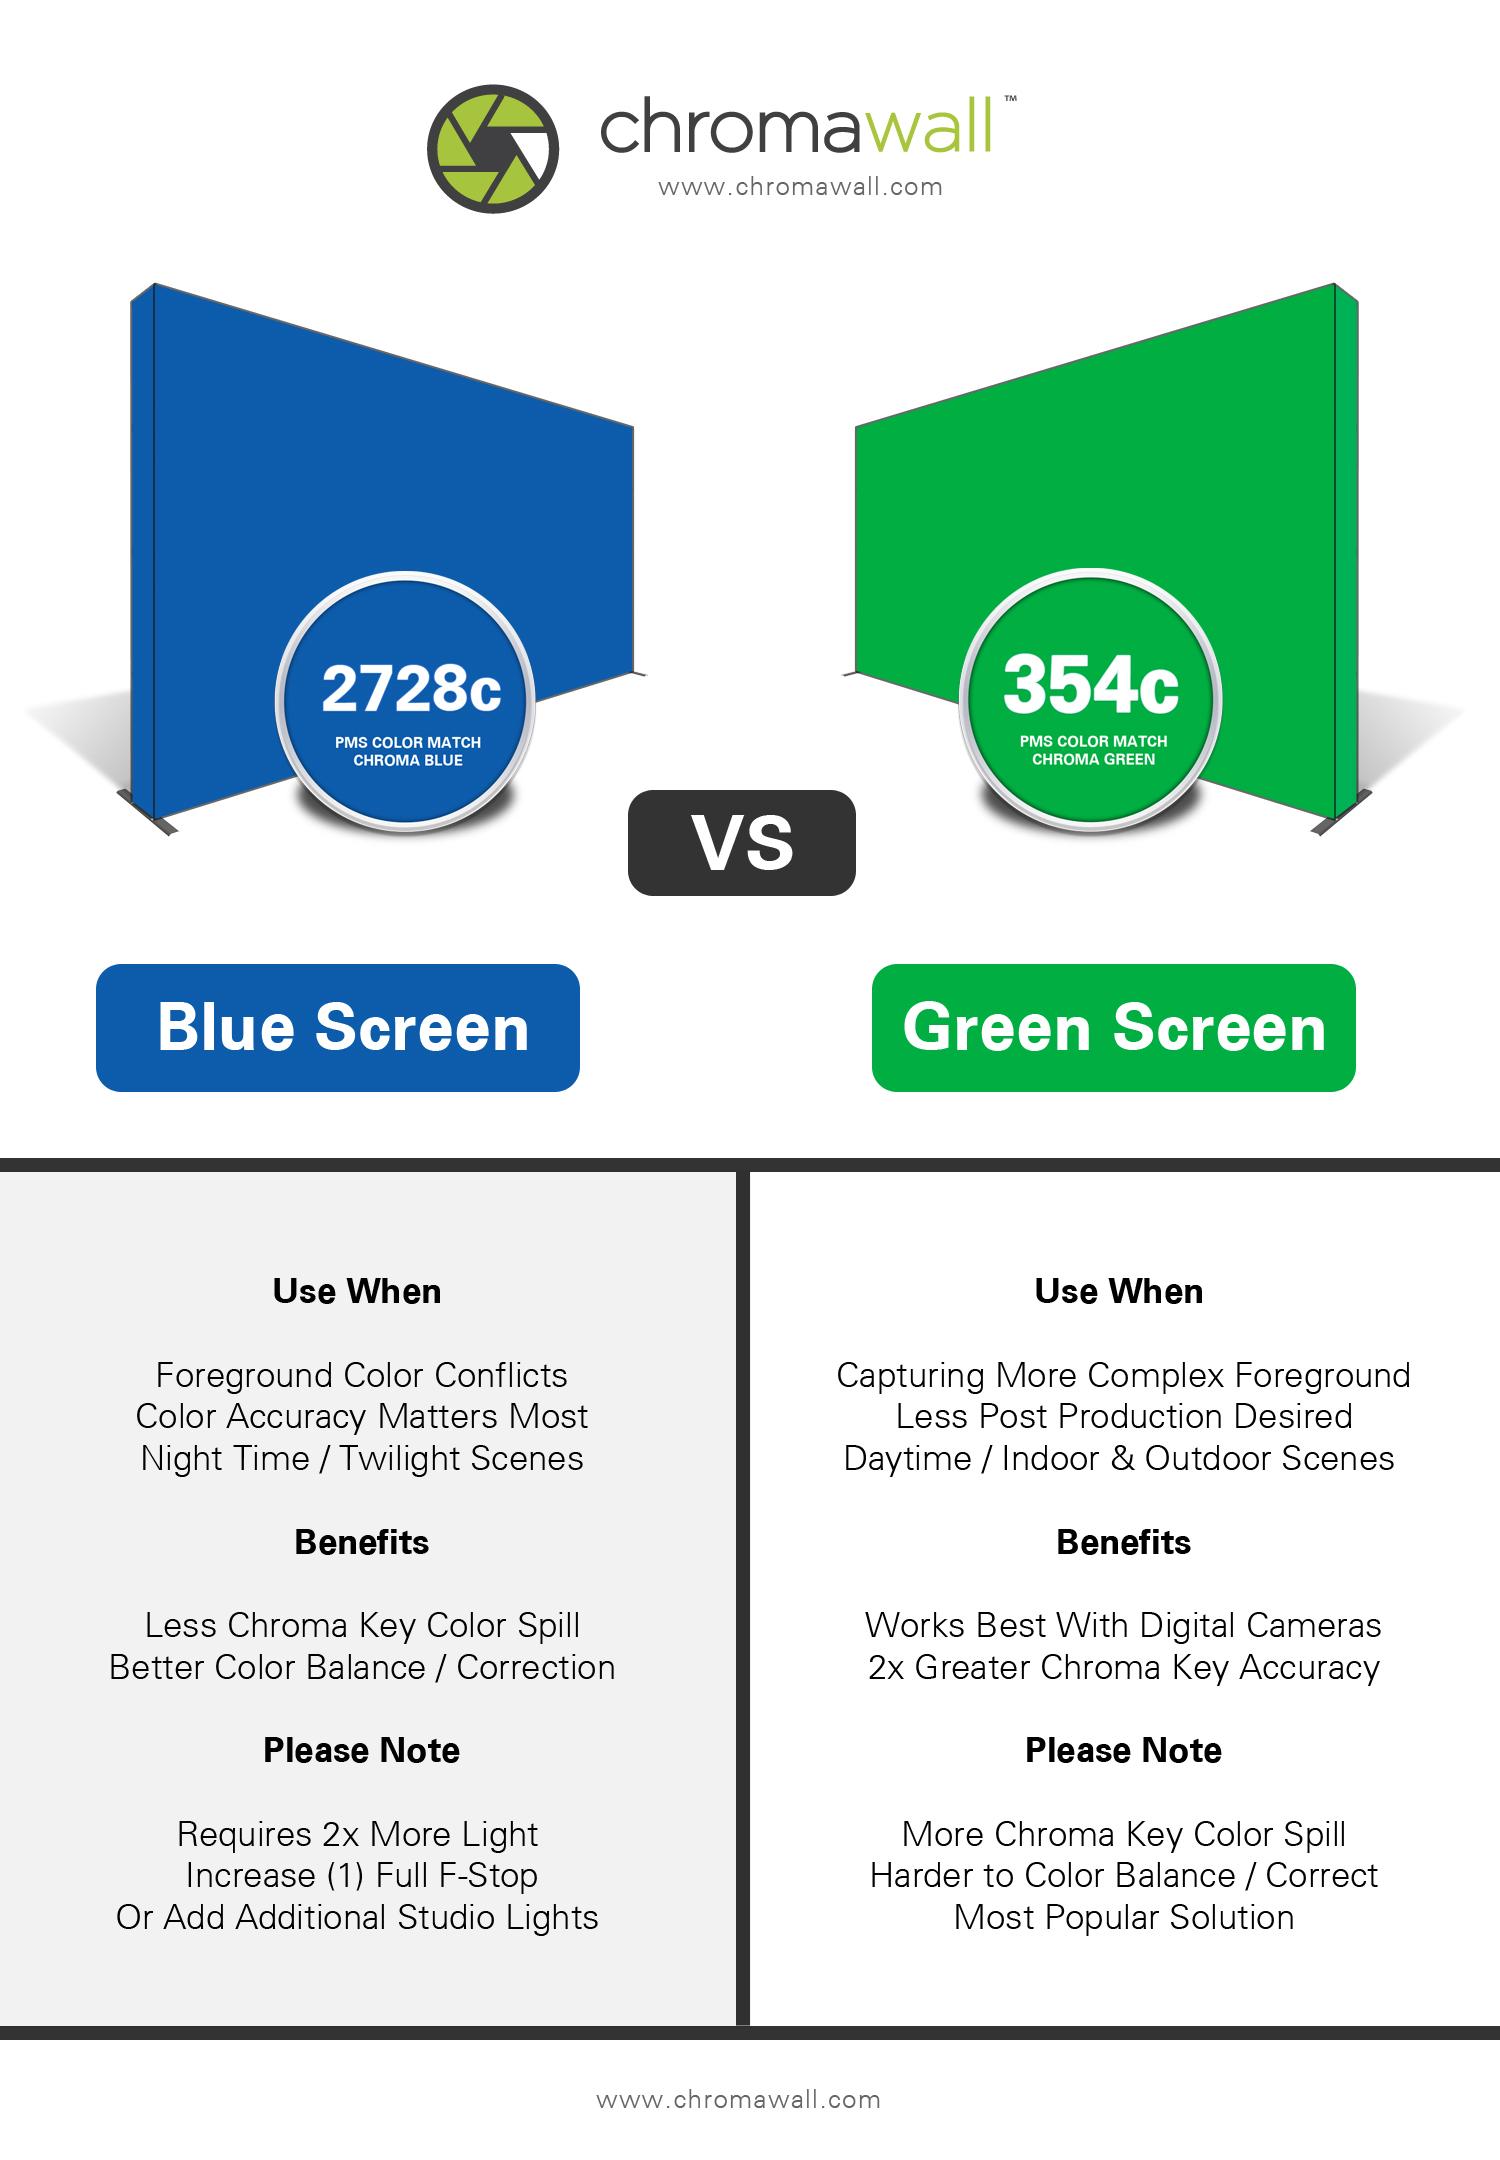 chroma key blue screen vs. green screen